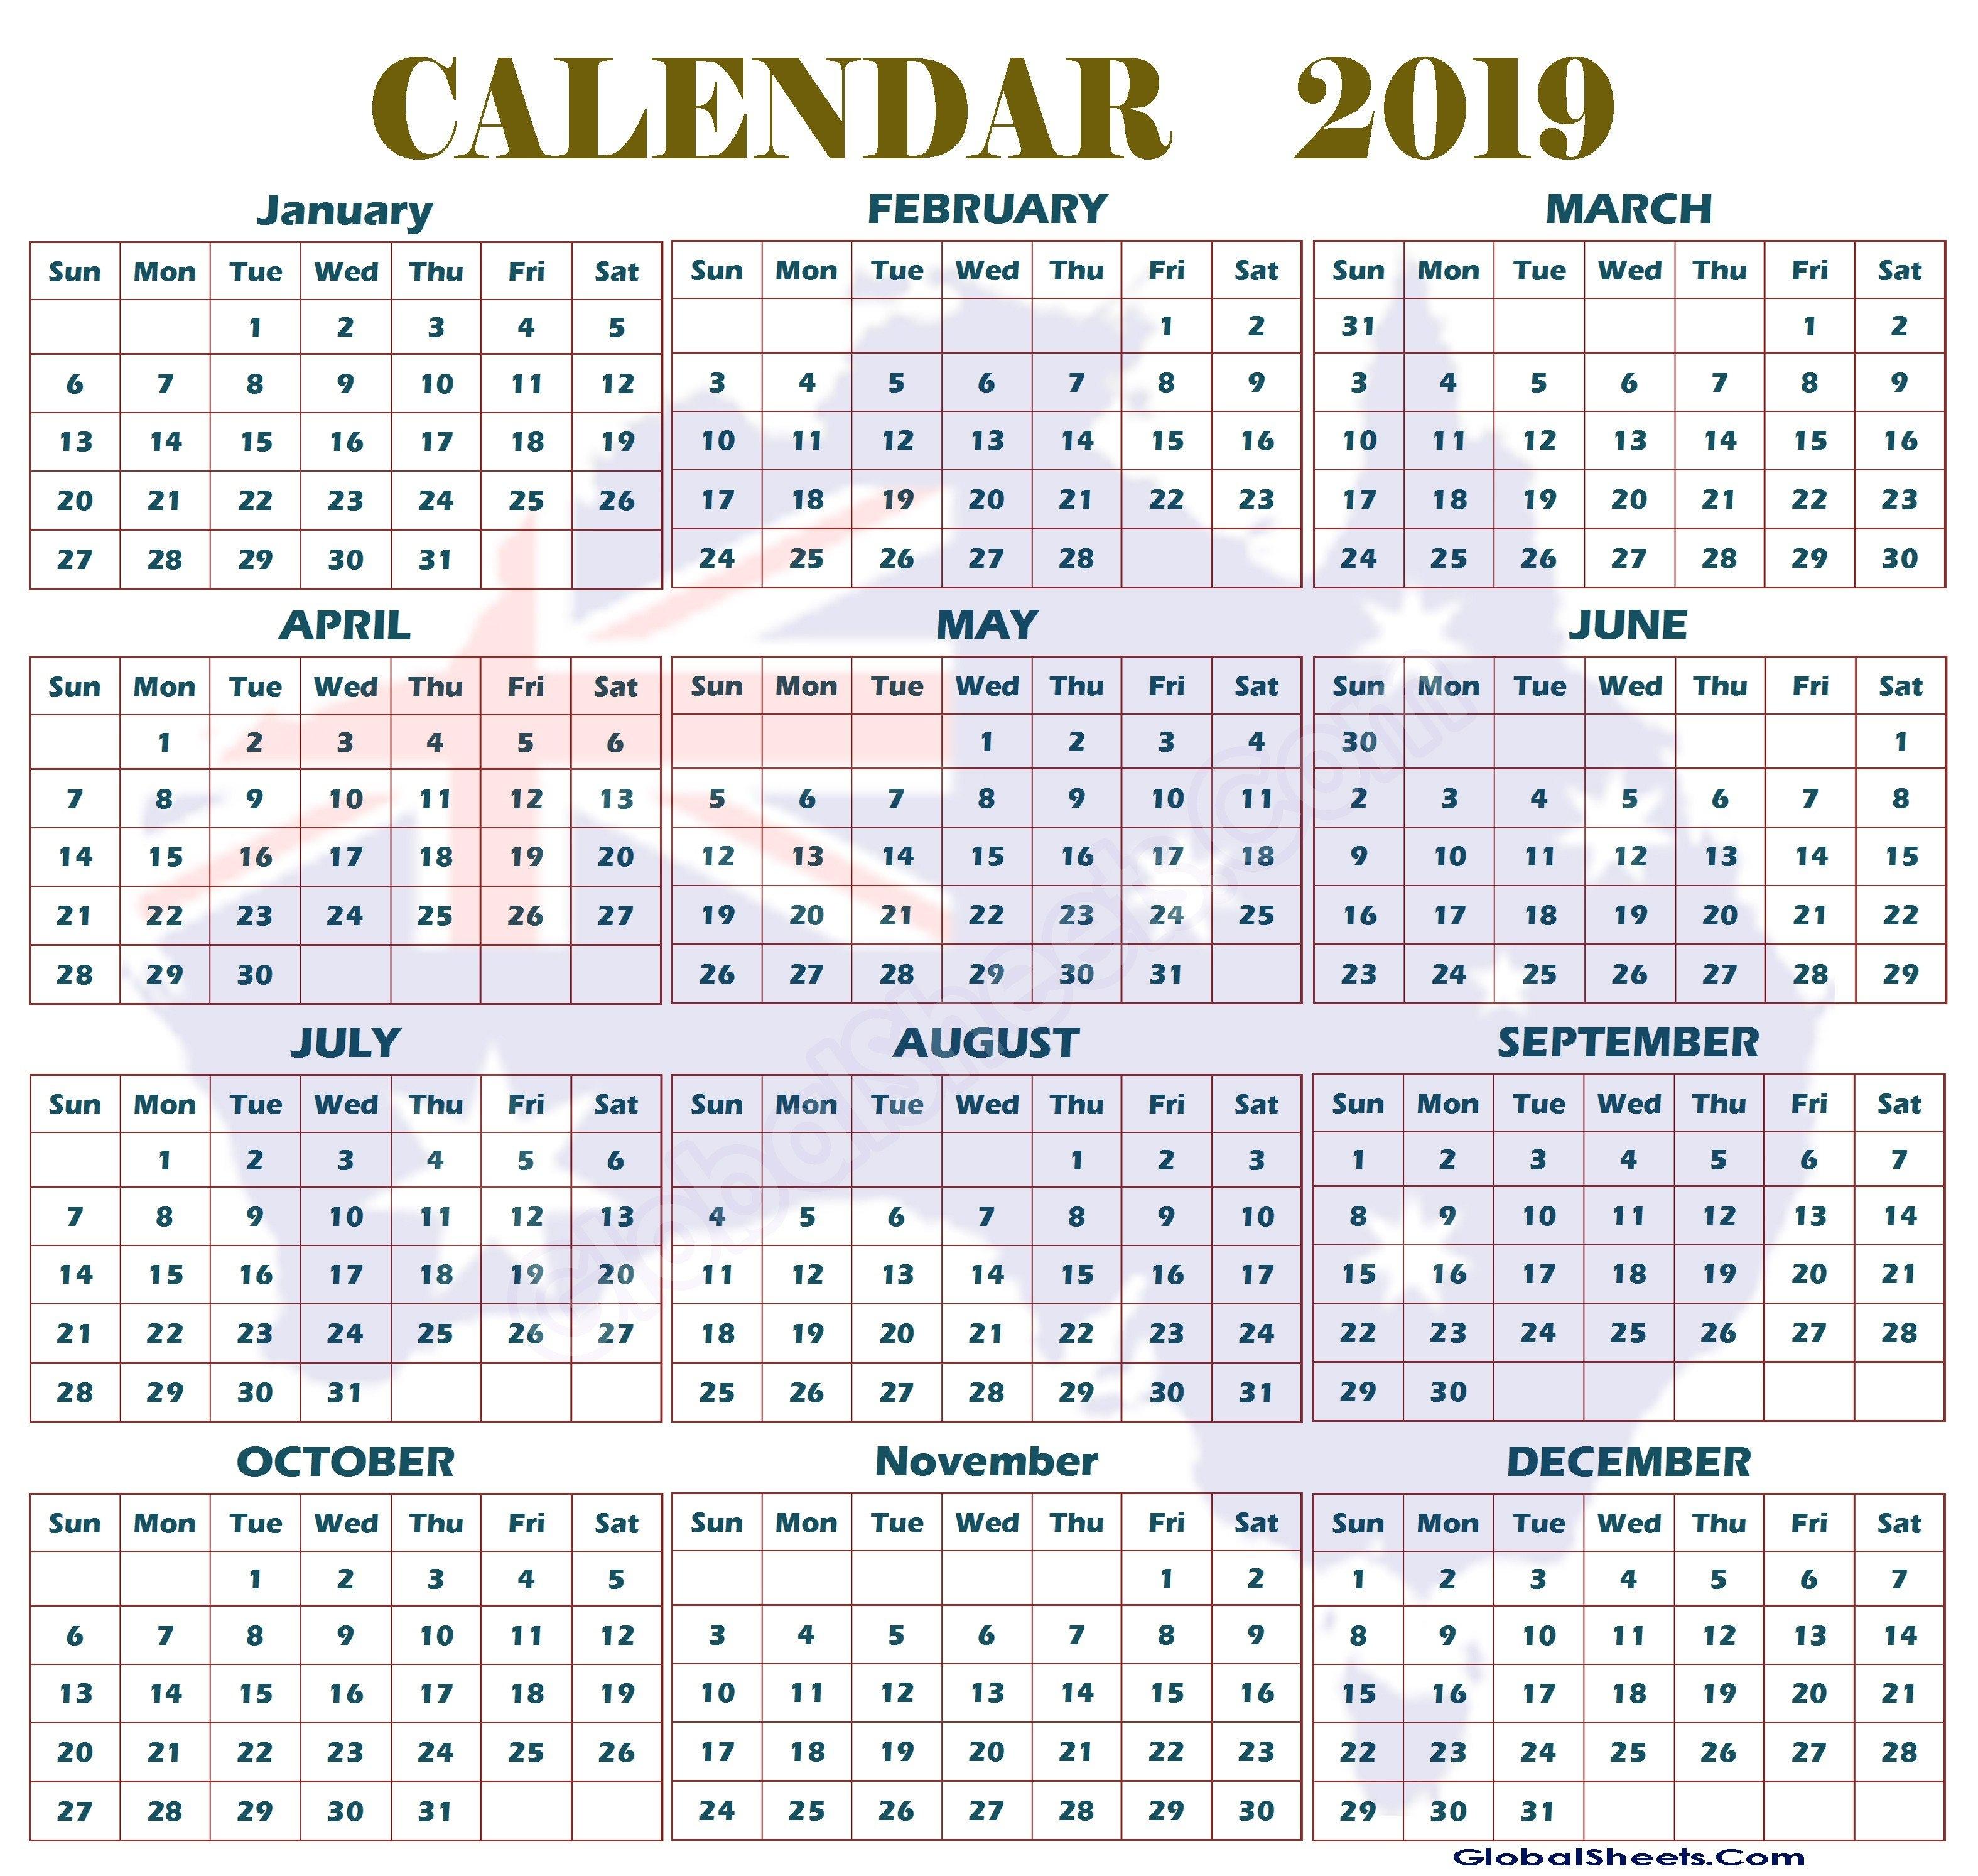 Australian 2019 Year Calendar - Littledelhisf 2019 Calendar Qld Printable